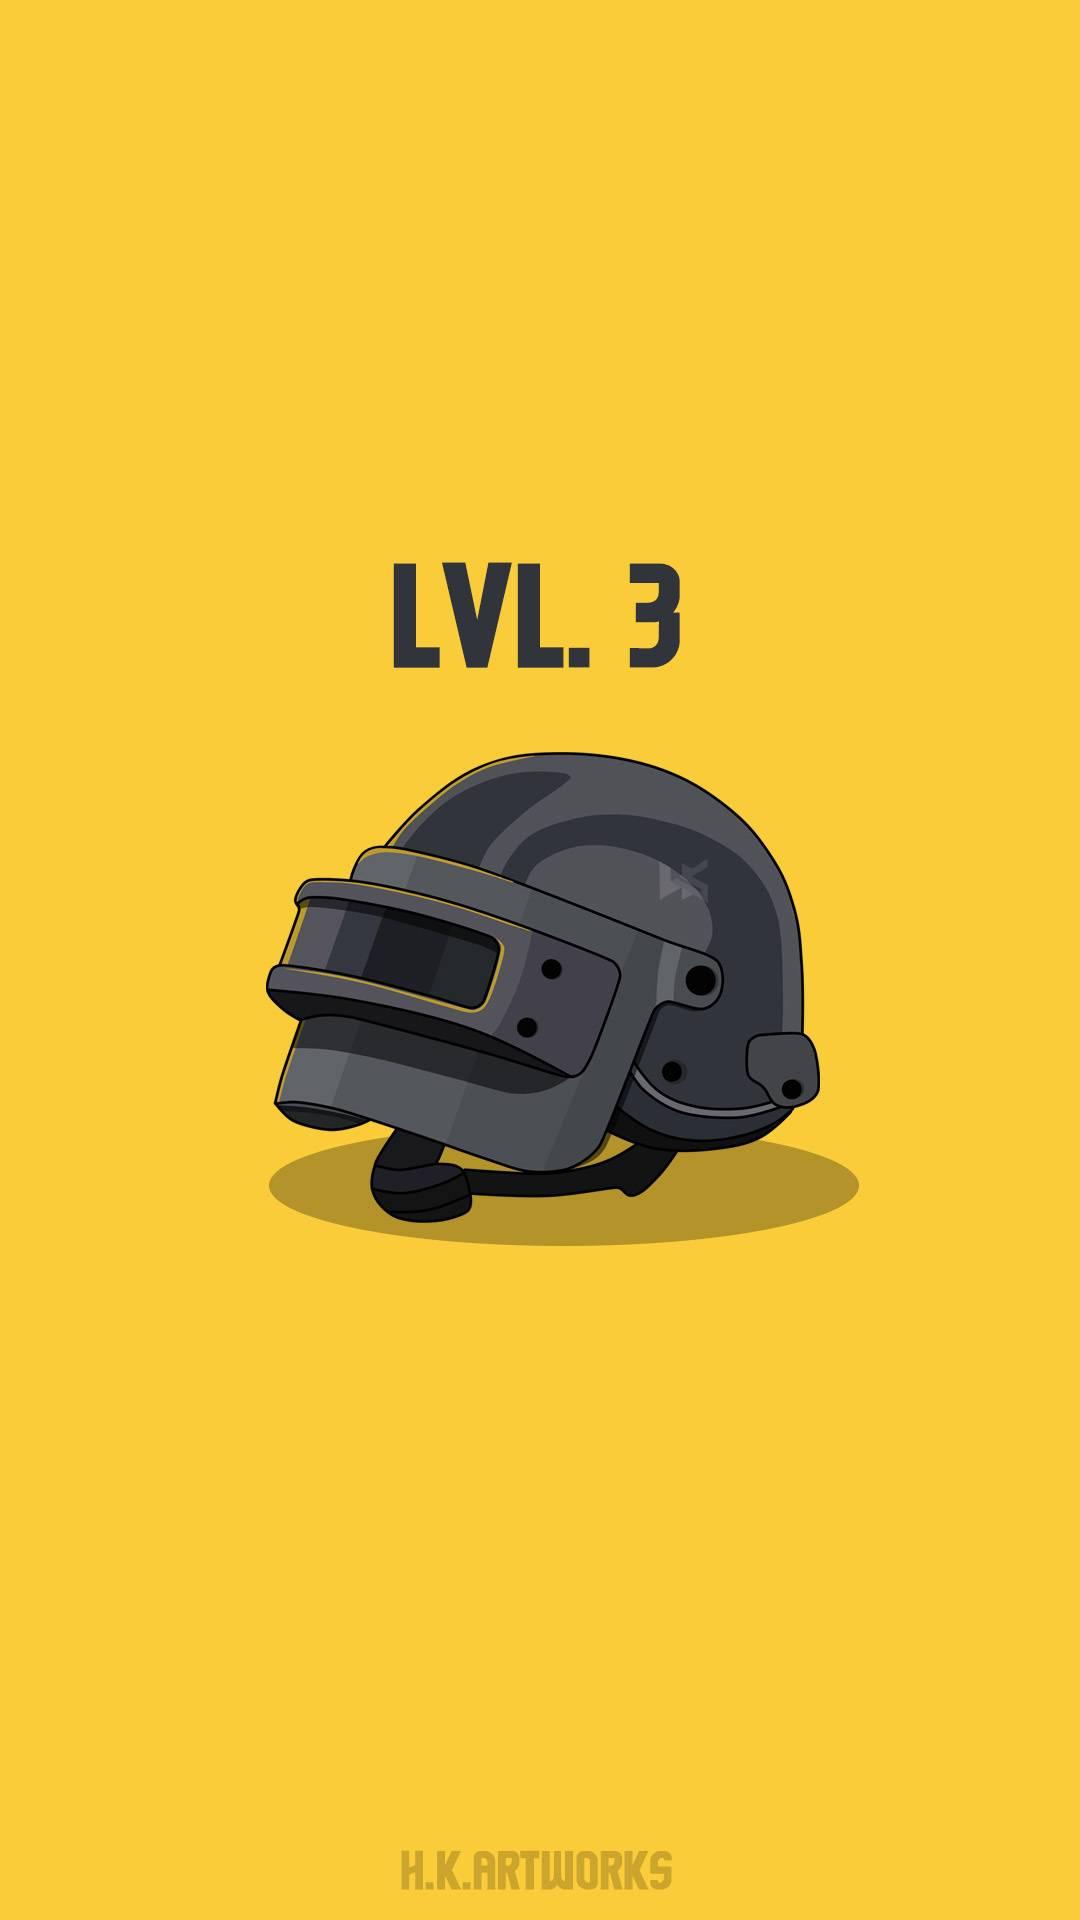 Pubg Lvl 3 Helmet iPhone Wallpaper